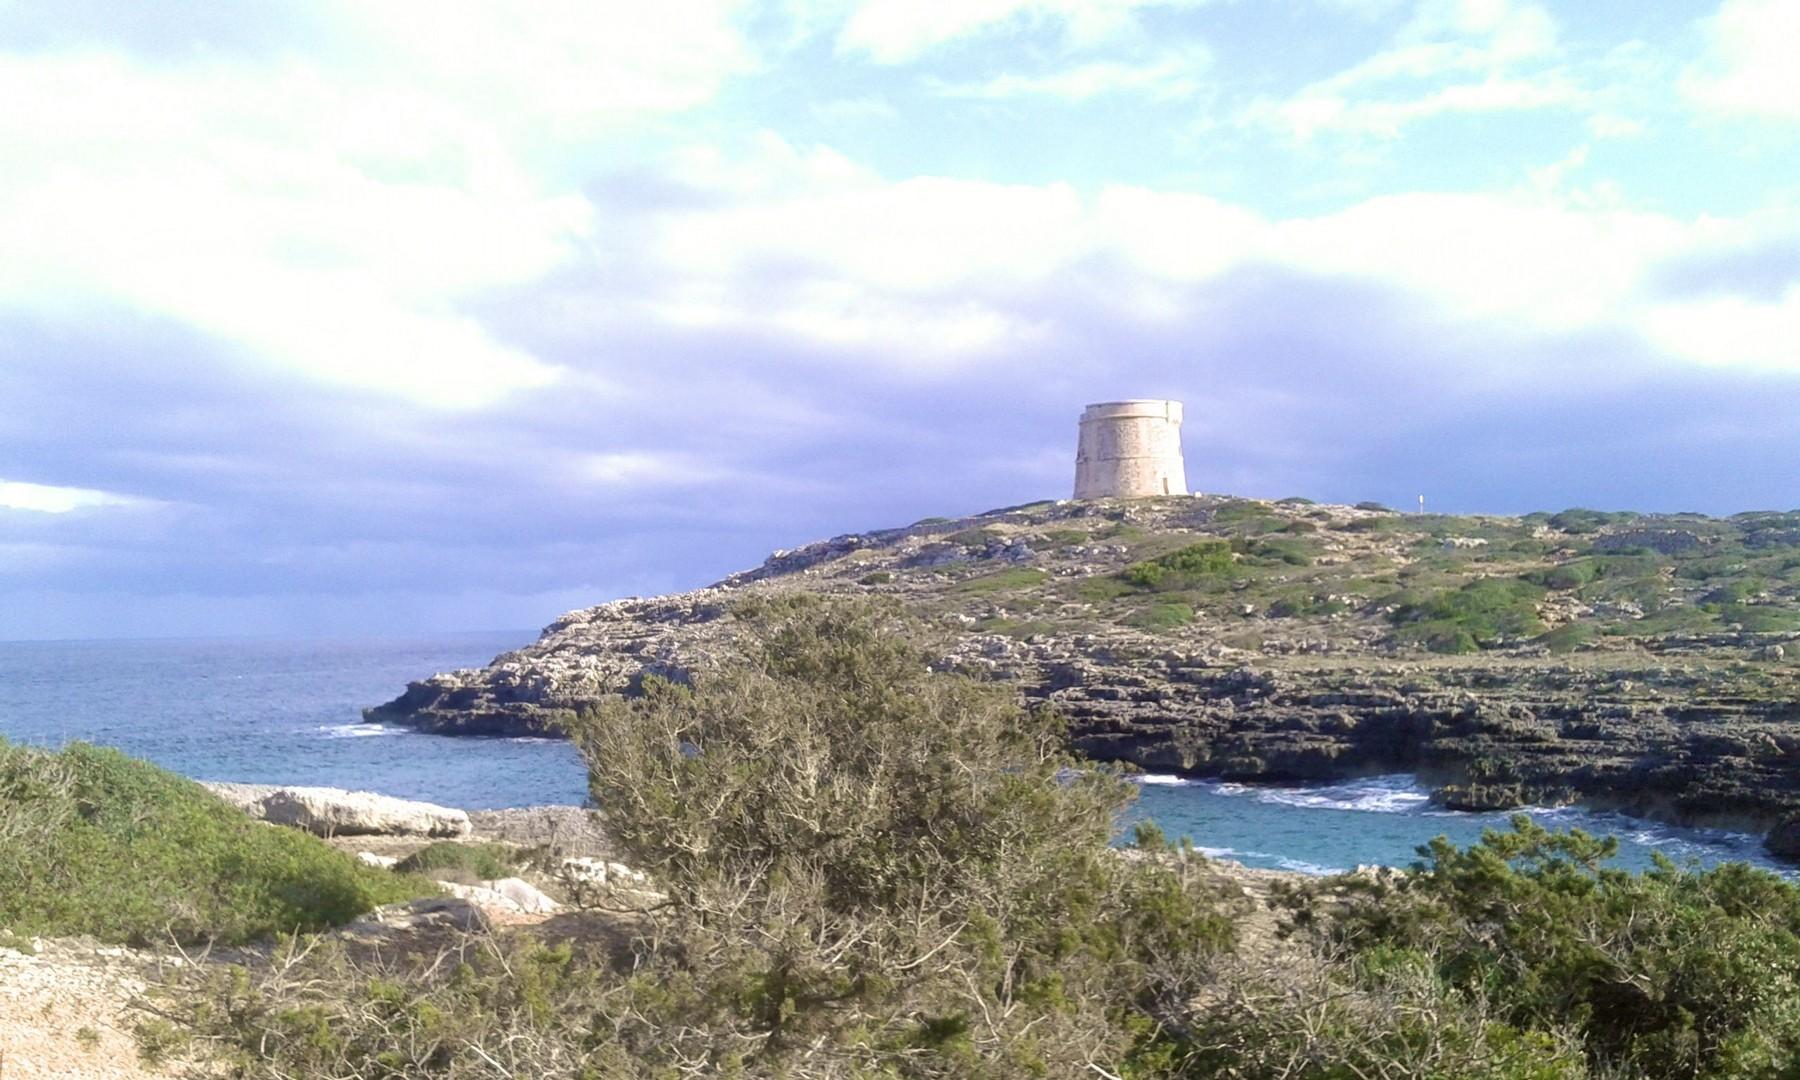 mountain-biking-holiday-menorca-spain-coastal-view.jpg - Spain - Menorca - Cami de Cavalls - Guided Mountain Bike Holiday - Mountain Biking